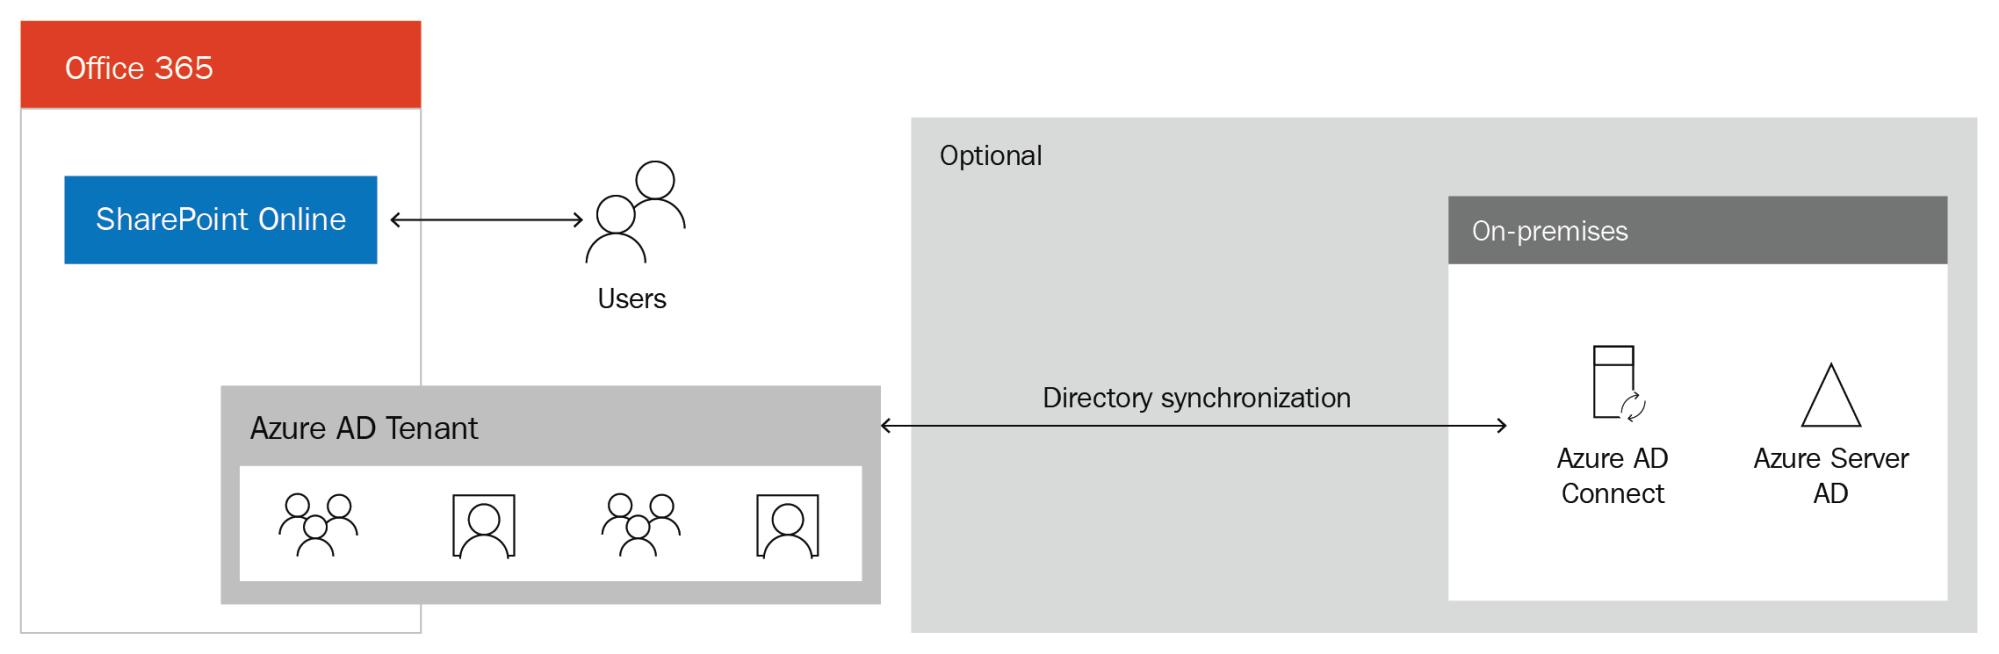 Architecture Of Sharepoint Online Office 365 Essentials